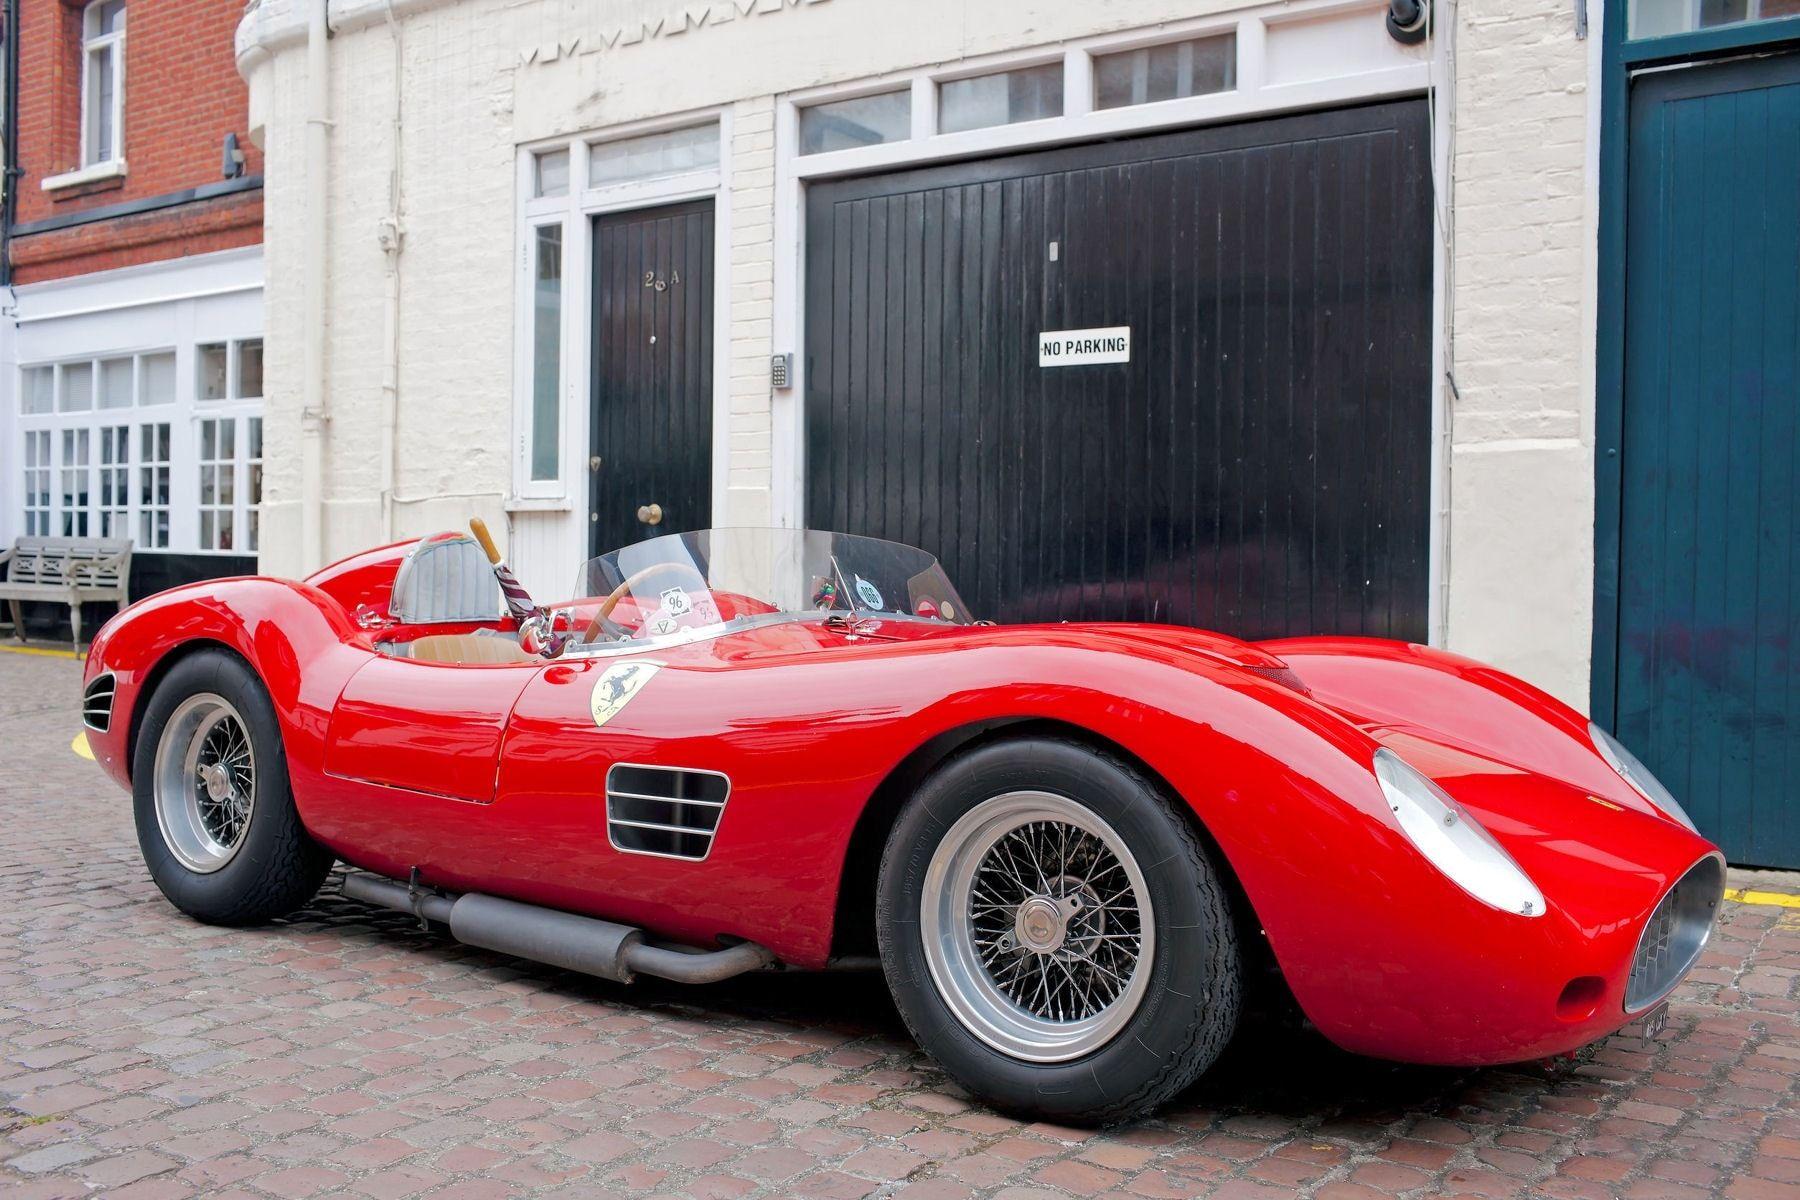 Ferrari 196 S : Les plus belles Ferrari de l'histoire - Linternaute